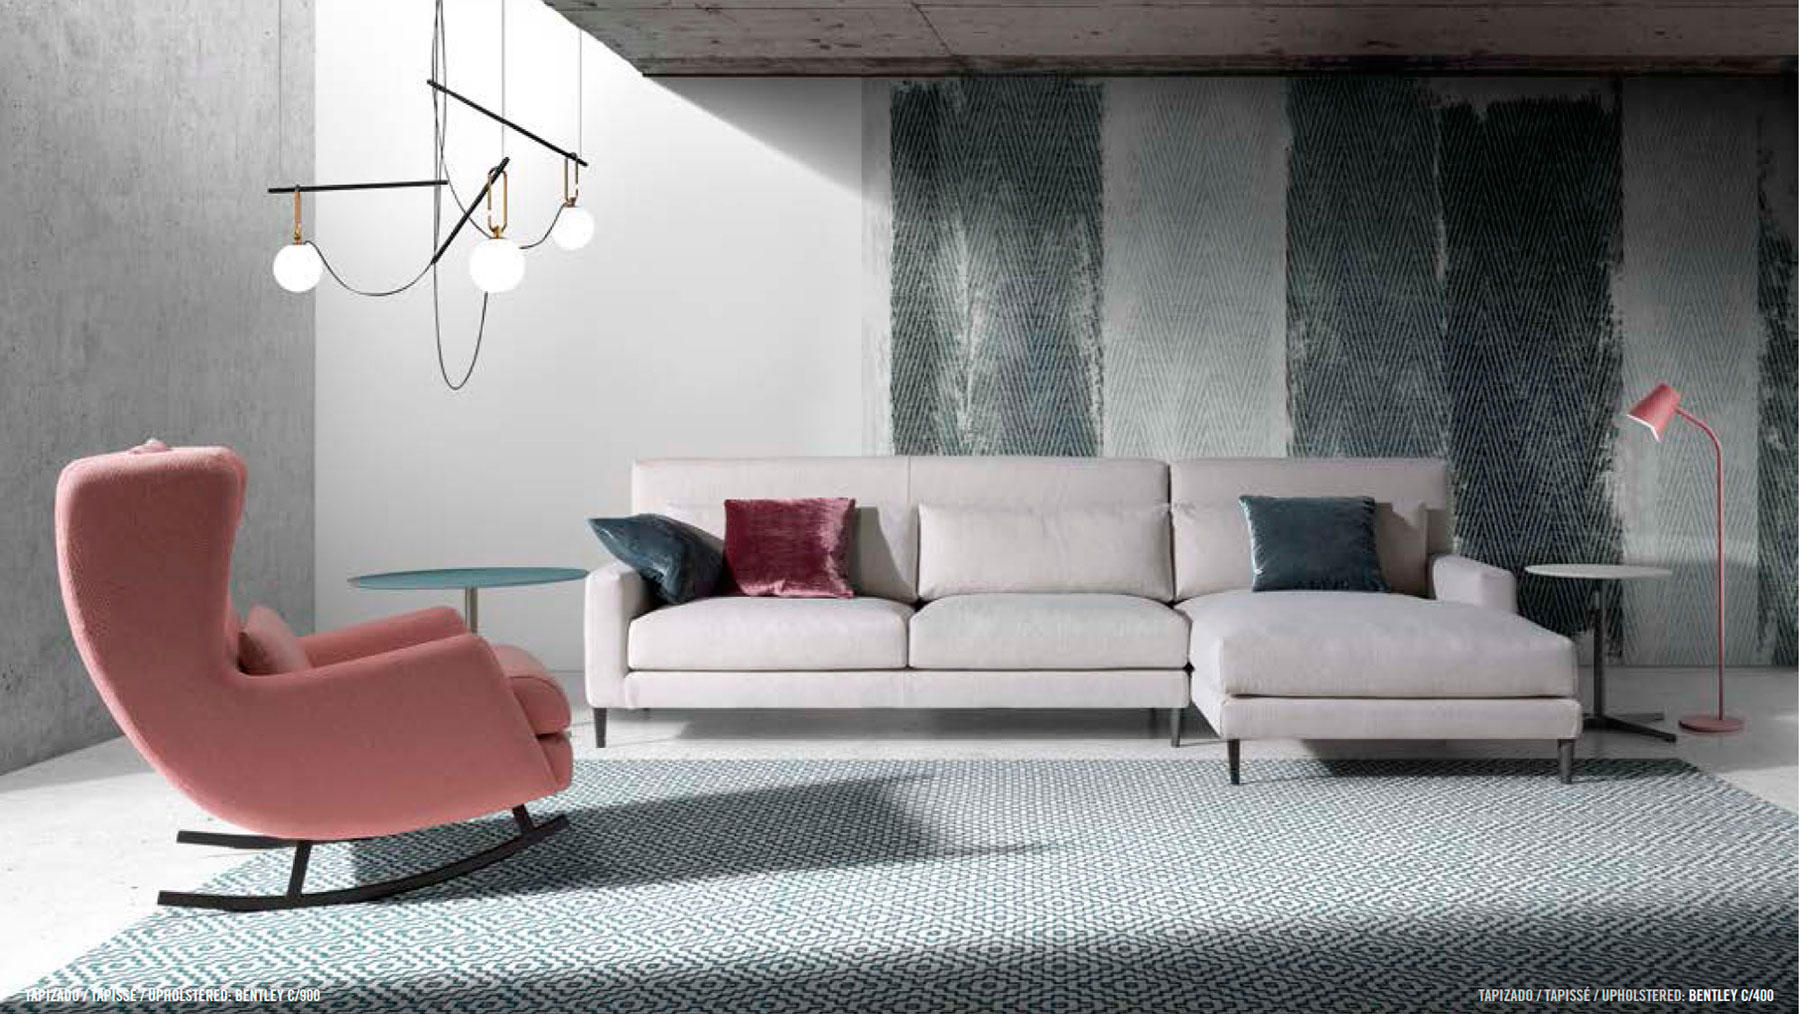 SofaS ENEAS+ Muebles Toscana